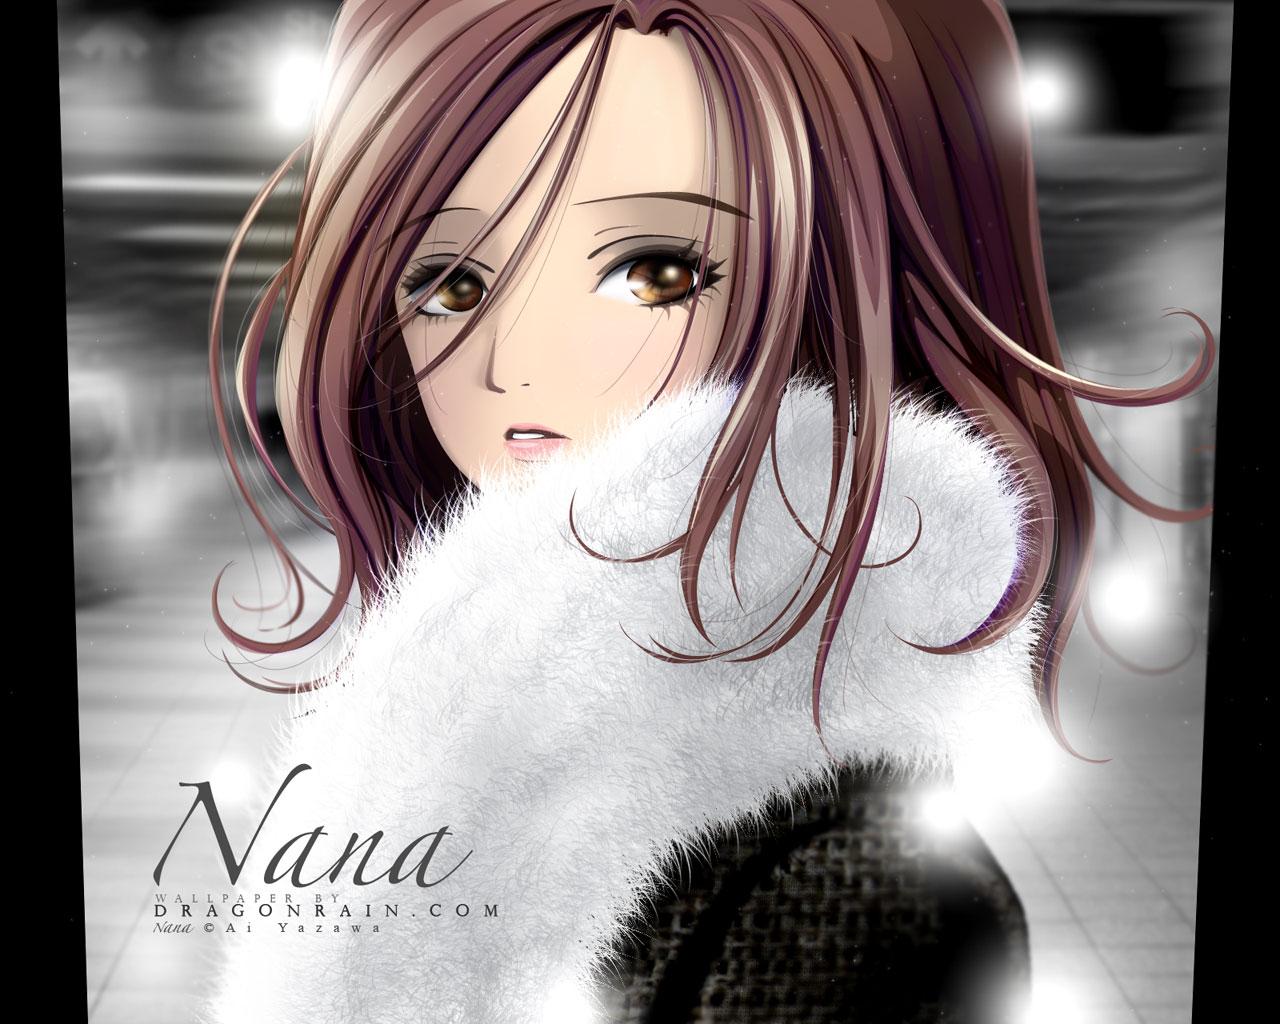 http://static.zerochan.net/Komatsu.Nana.full.72602.jpg